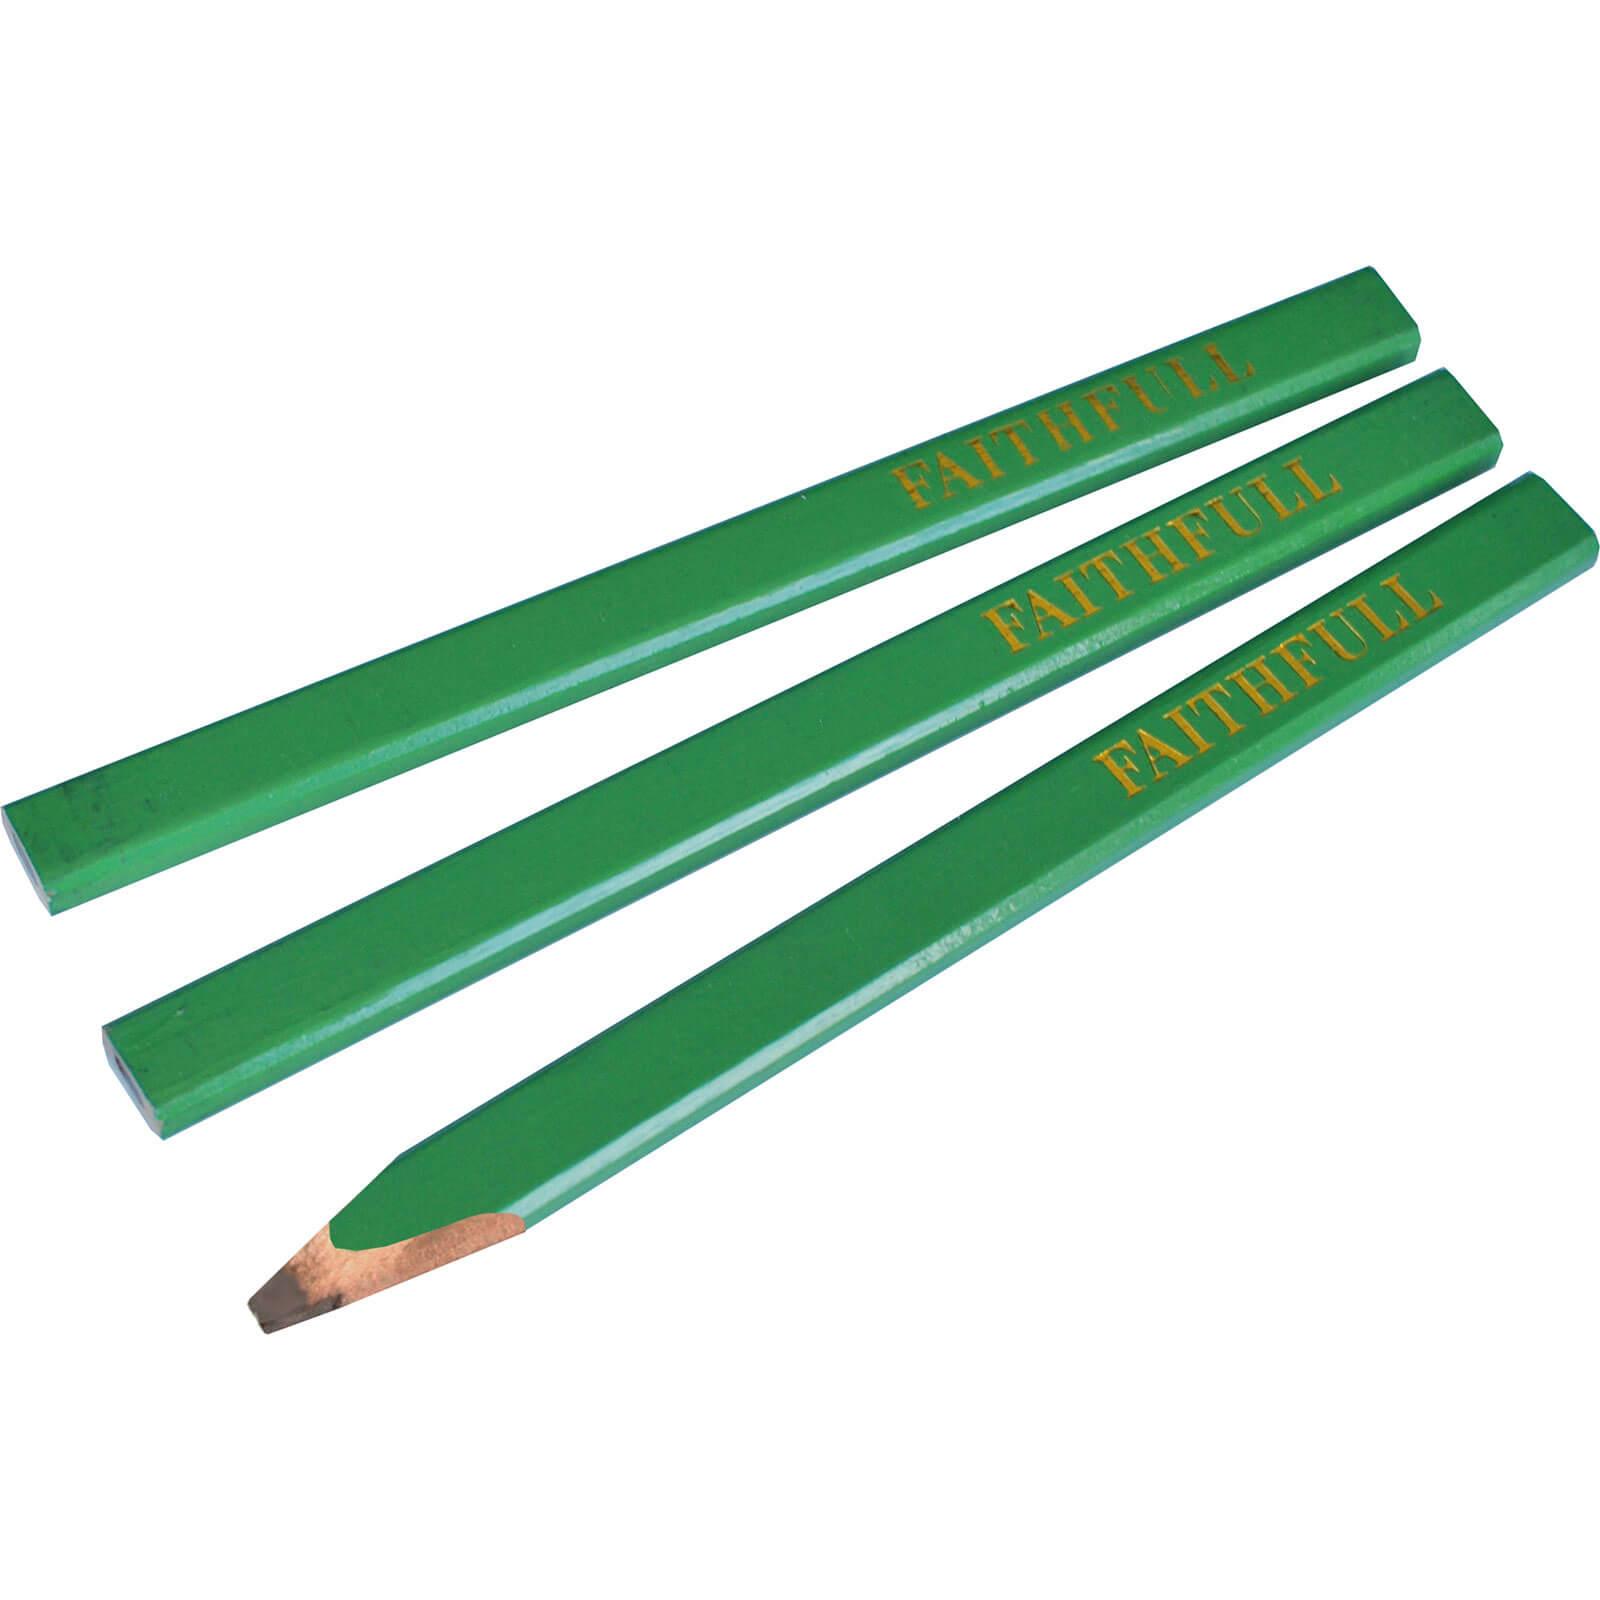 Tooled Up/Tools/Lasers & levelling/Faithfull Carpenters Pencils - Green - Hard